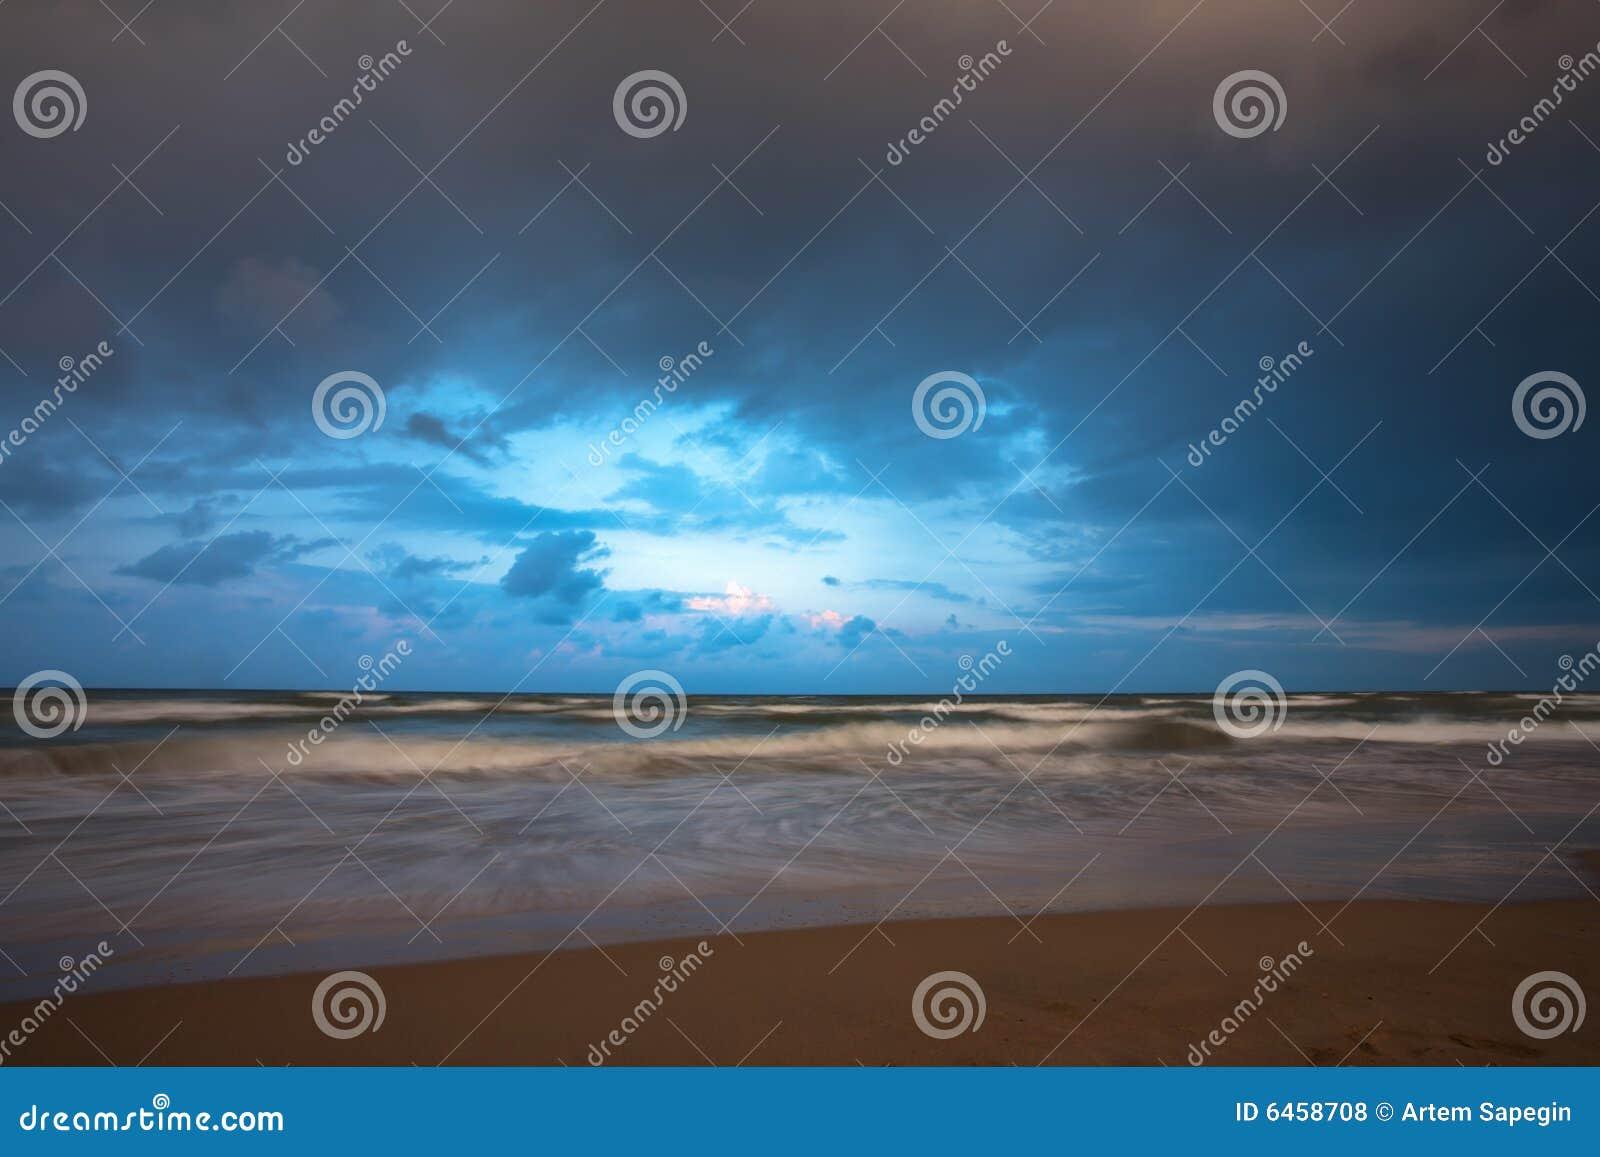 Pogoda sztormowa morska